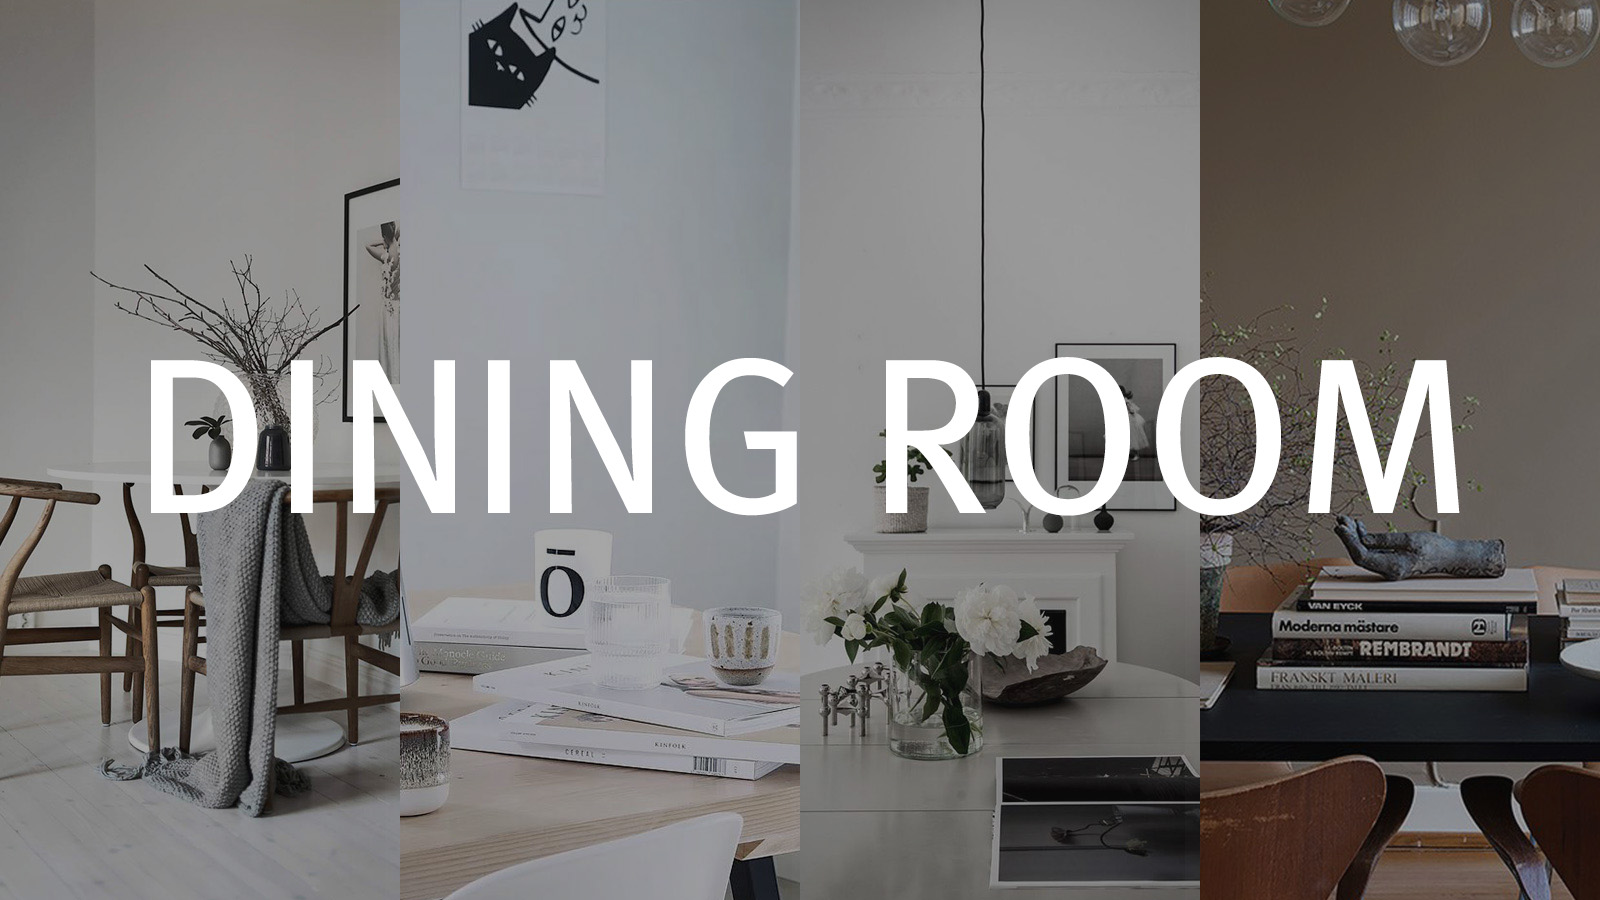 Details per Space - Dining Room.jpg